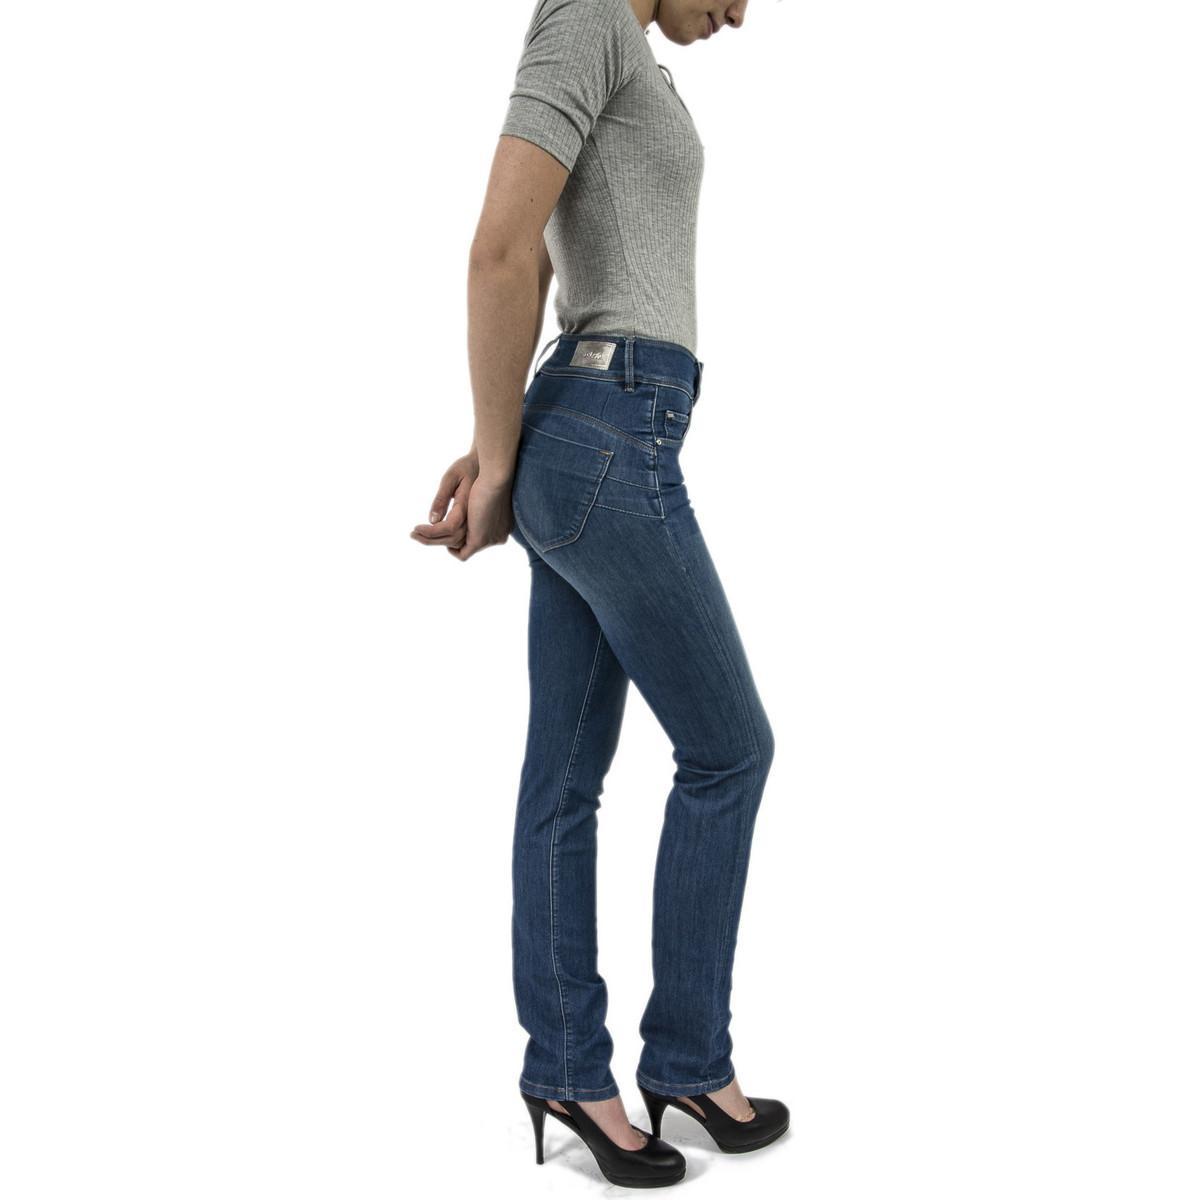 105503 - secret femmes Jeans en bleu Jean Salsa en coloris Bleu